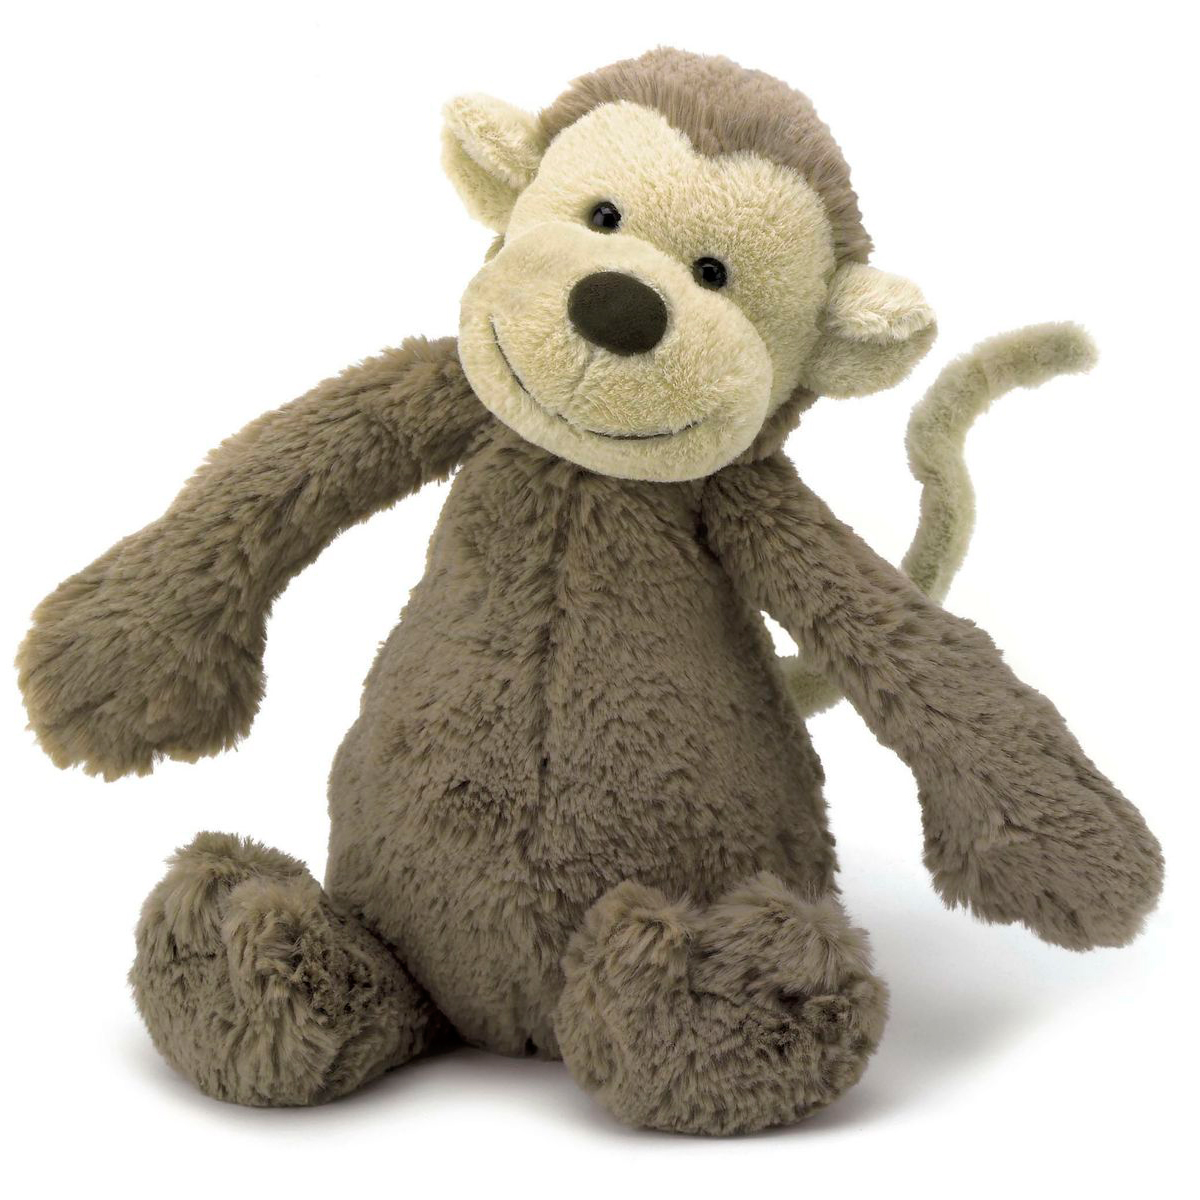 Peluche Bashful Monkey - Medium Bashful Monkey - Medium